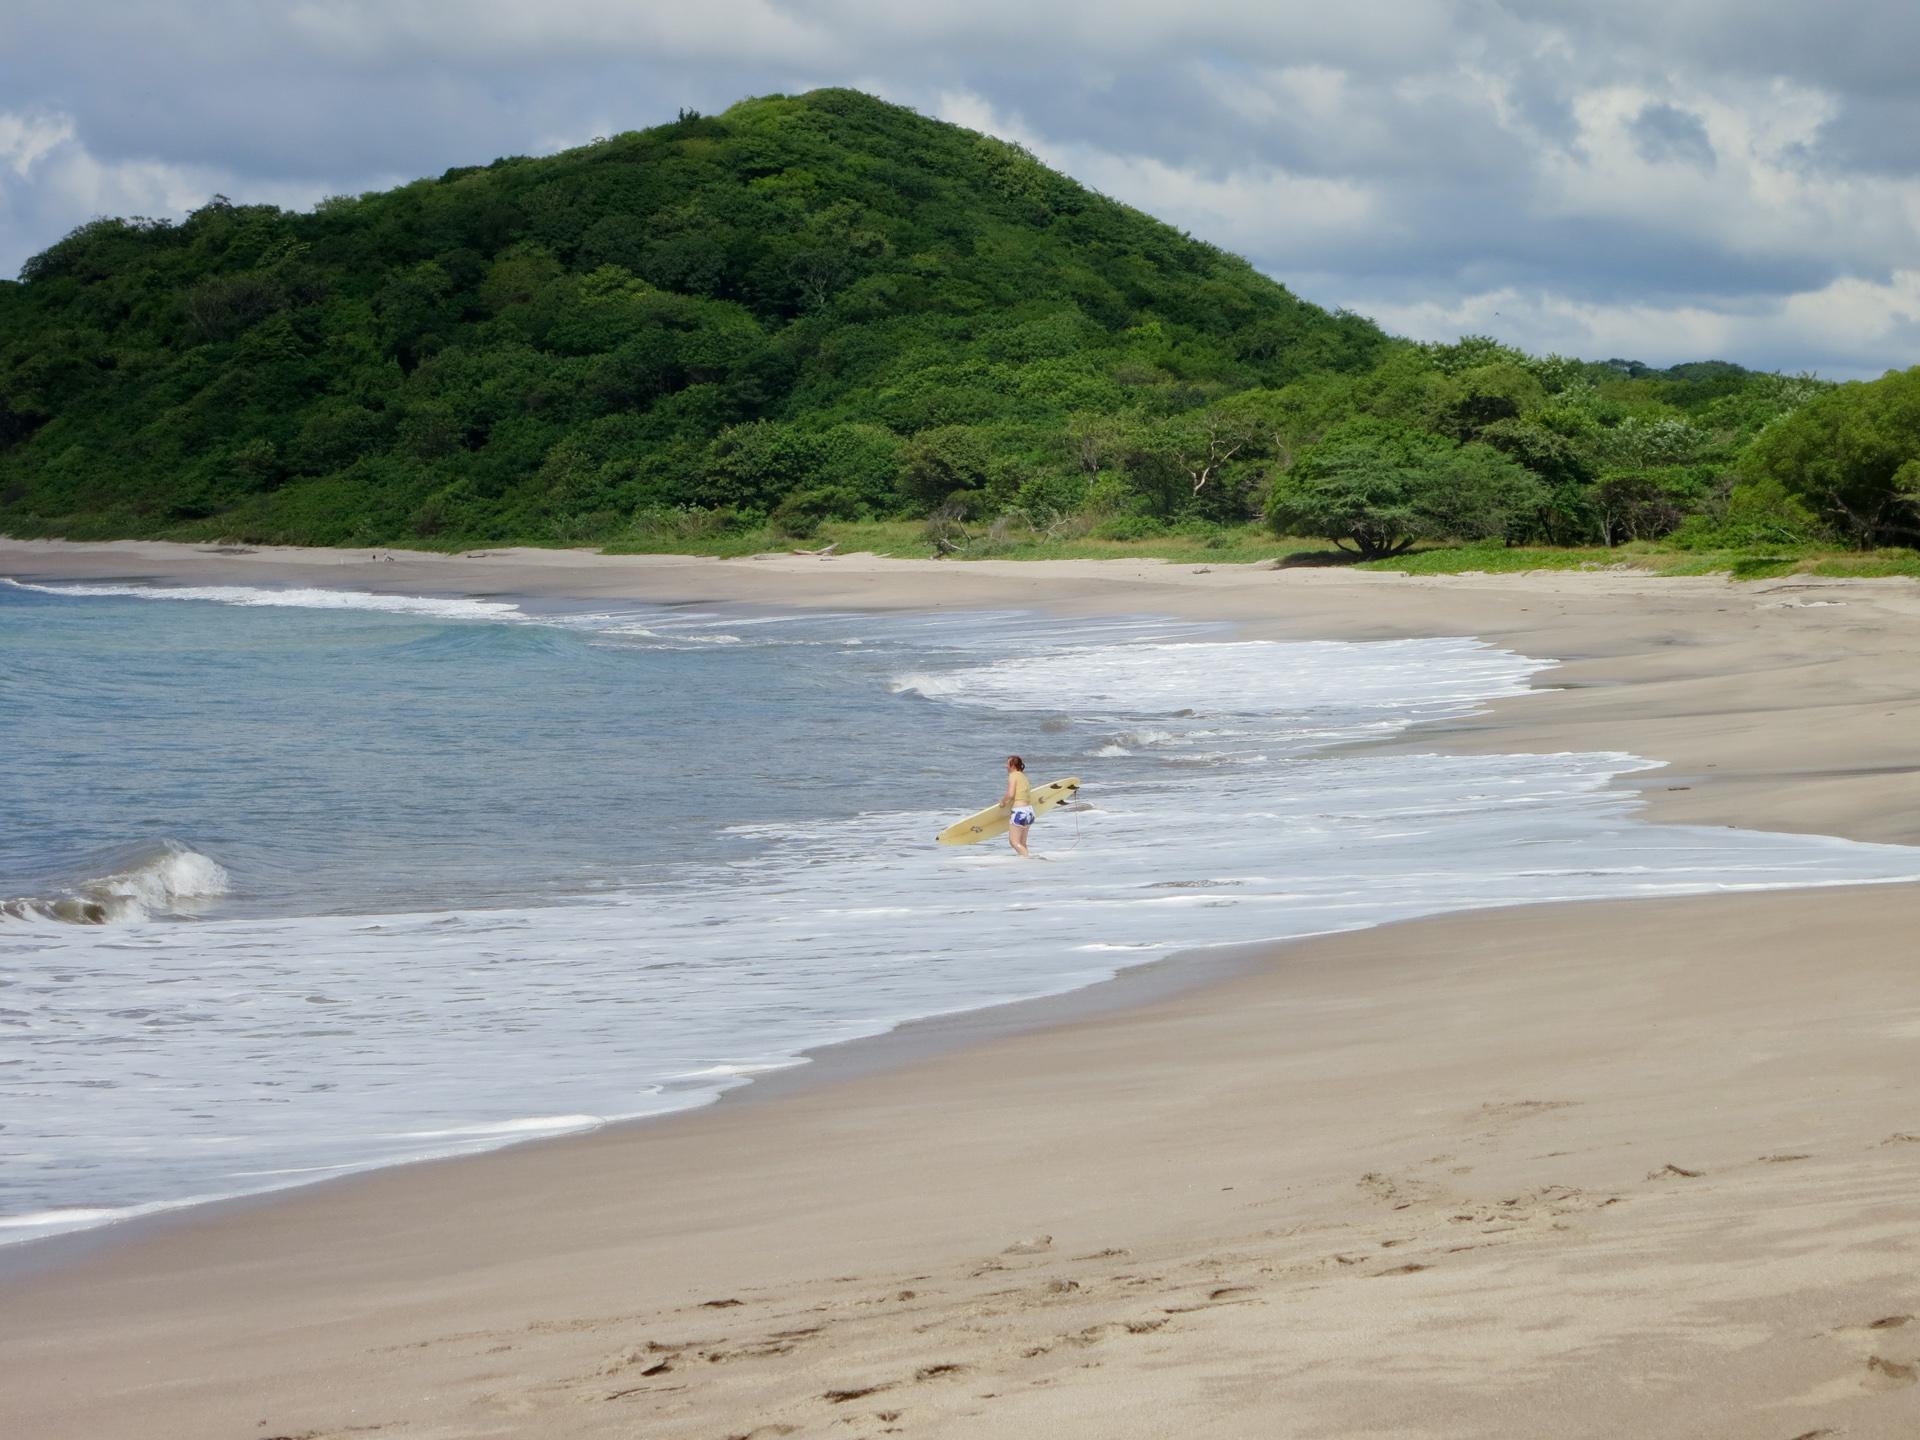 Surfing at Playa Catalina in Nicaragua